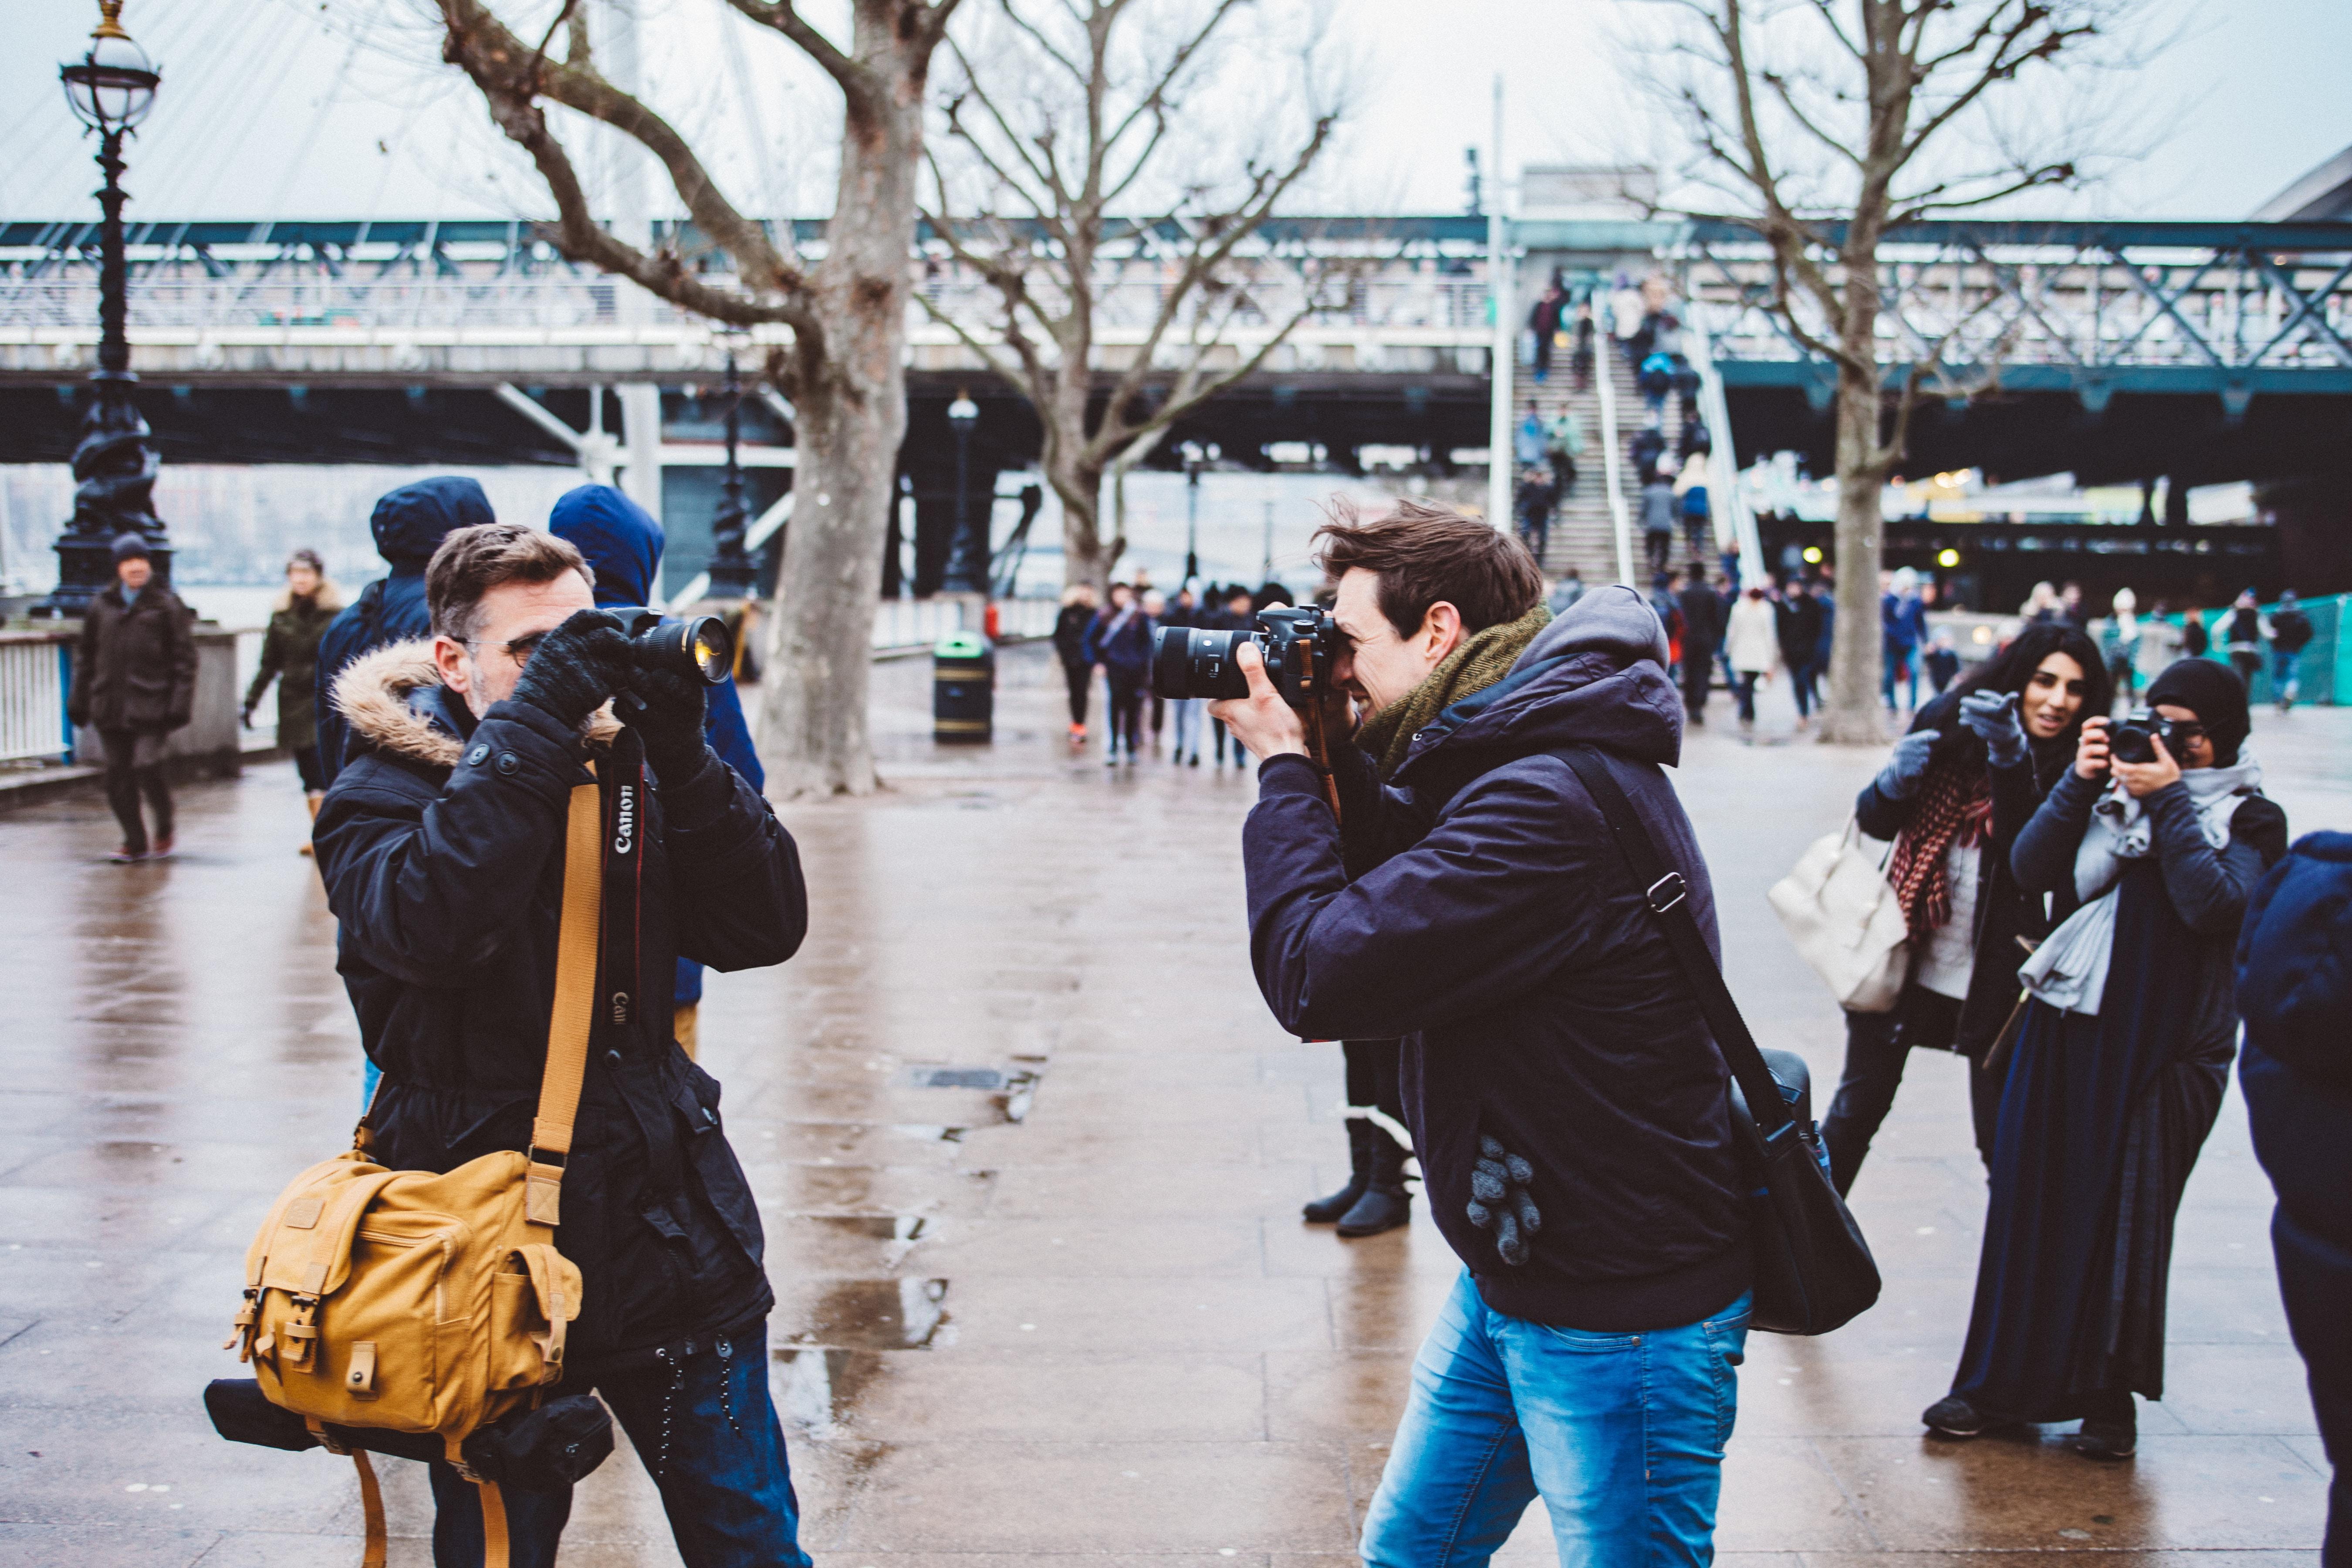 Photographes PhotoPresta